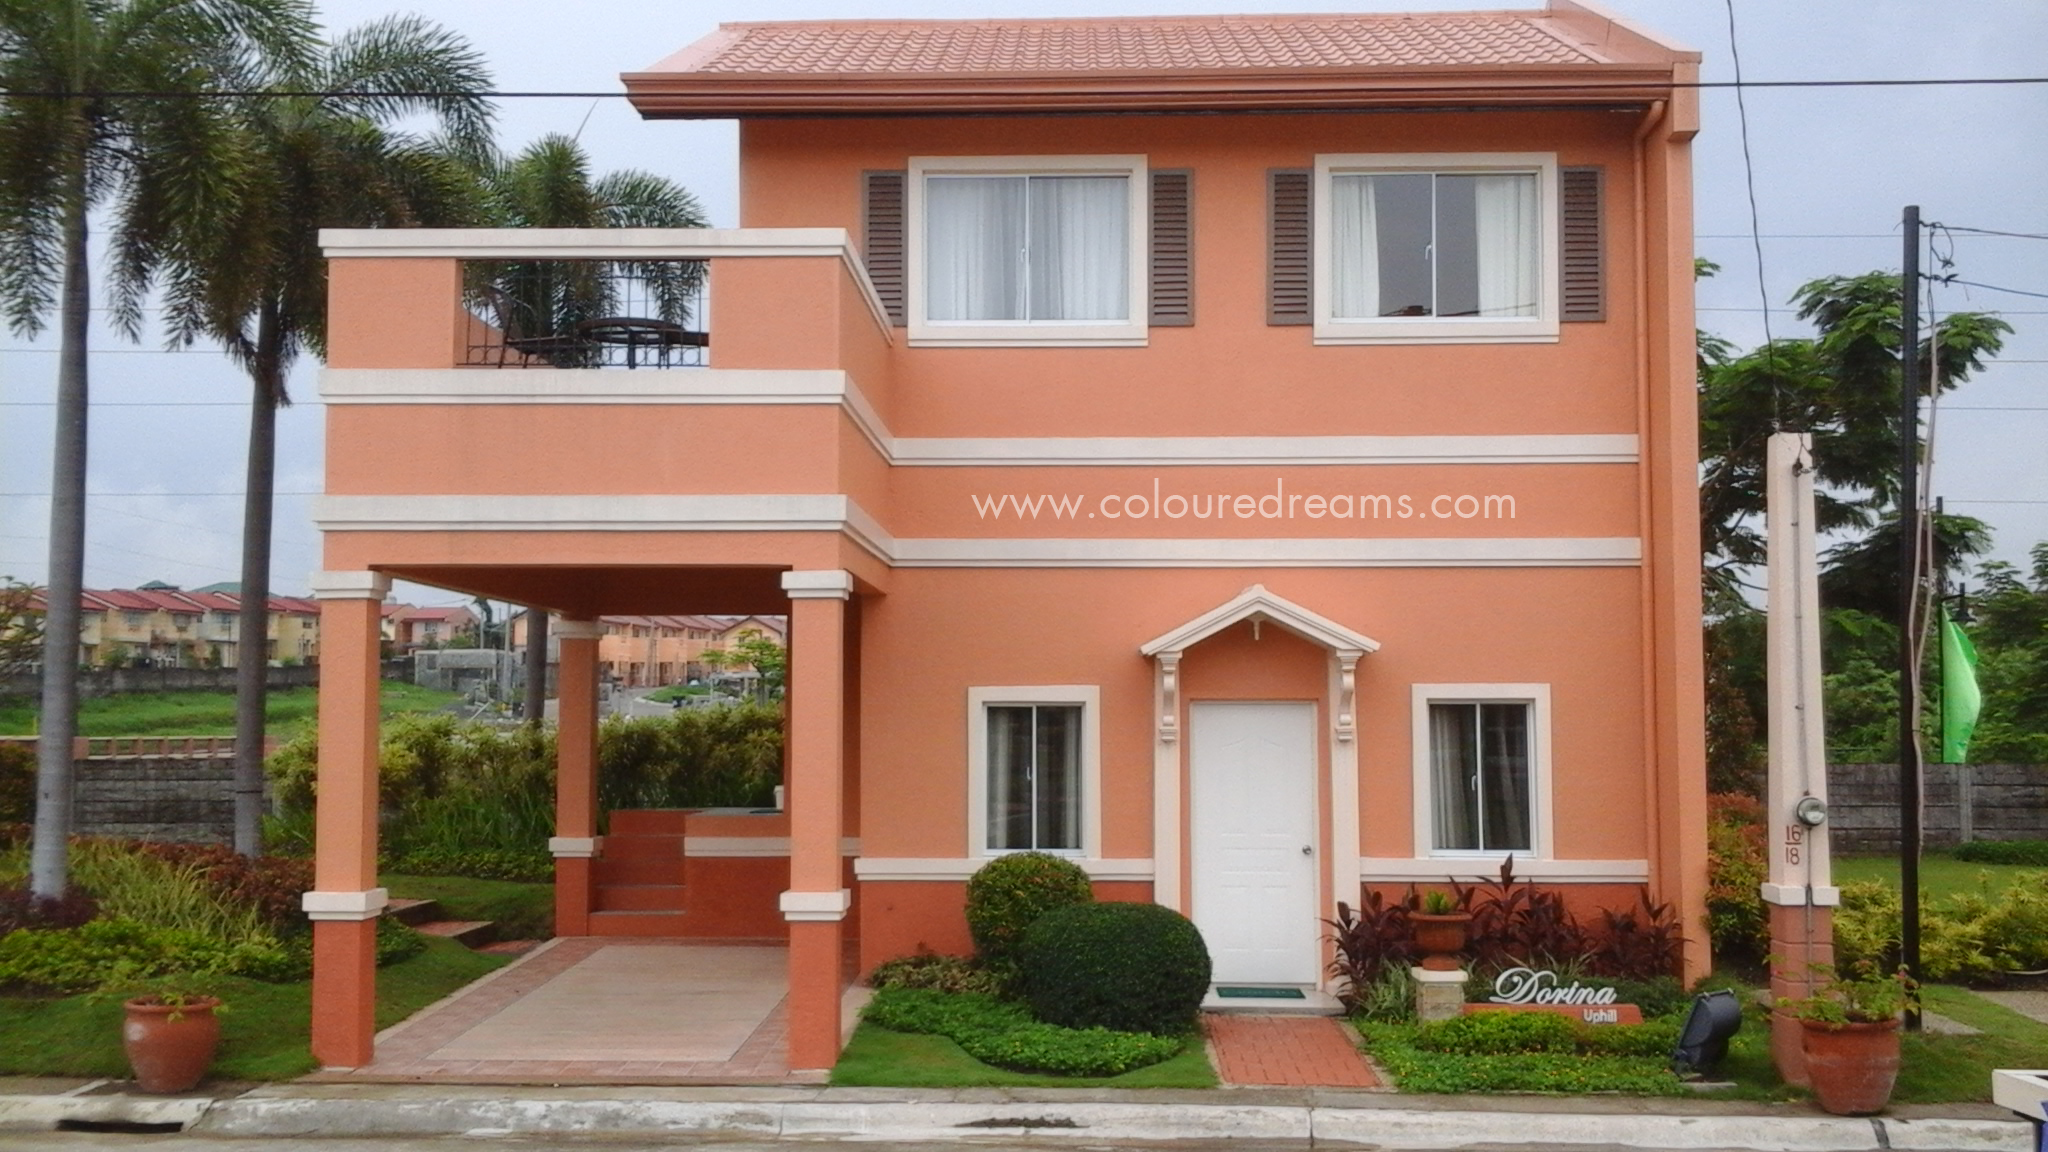 Camella silang tagaytay drina house and lot for sale in tagaytay city - 01 Dorina Uphill Model